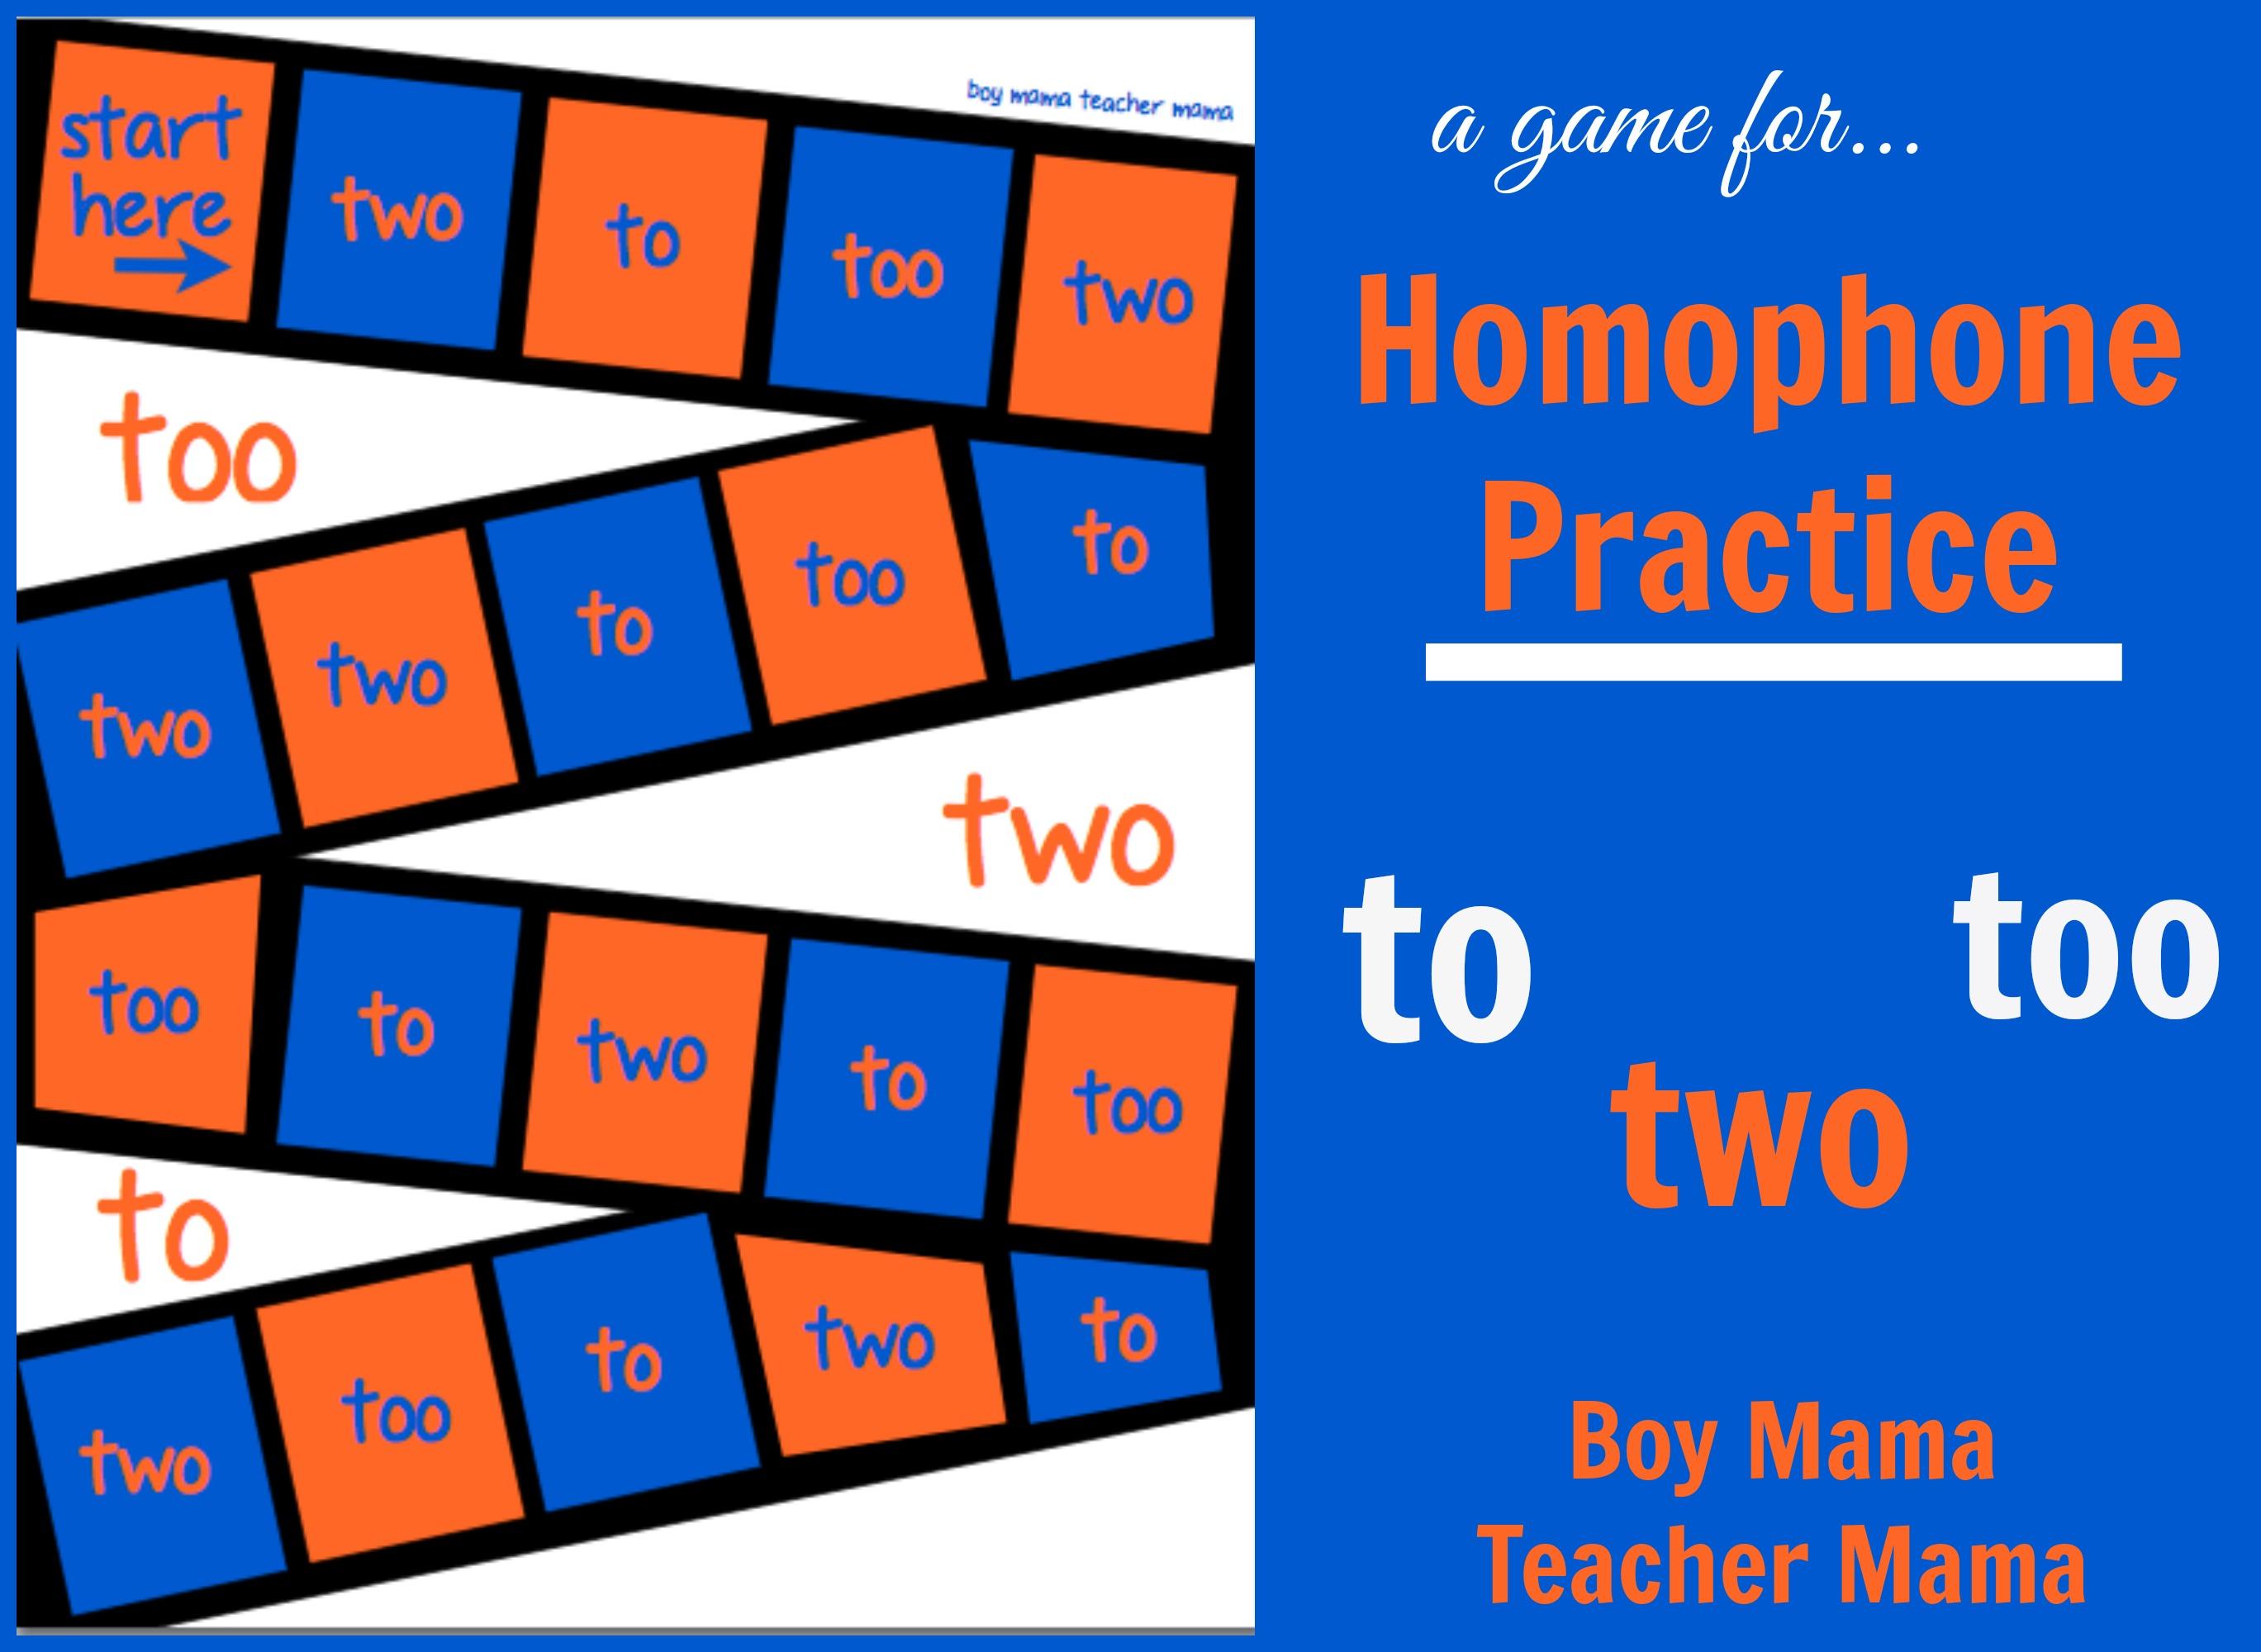 Teacher Mama Homophone Practice To Too Two Boy Mama